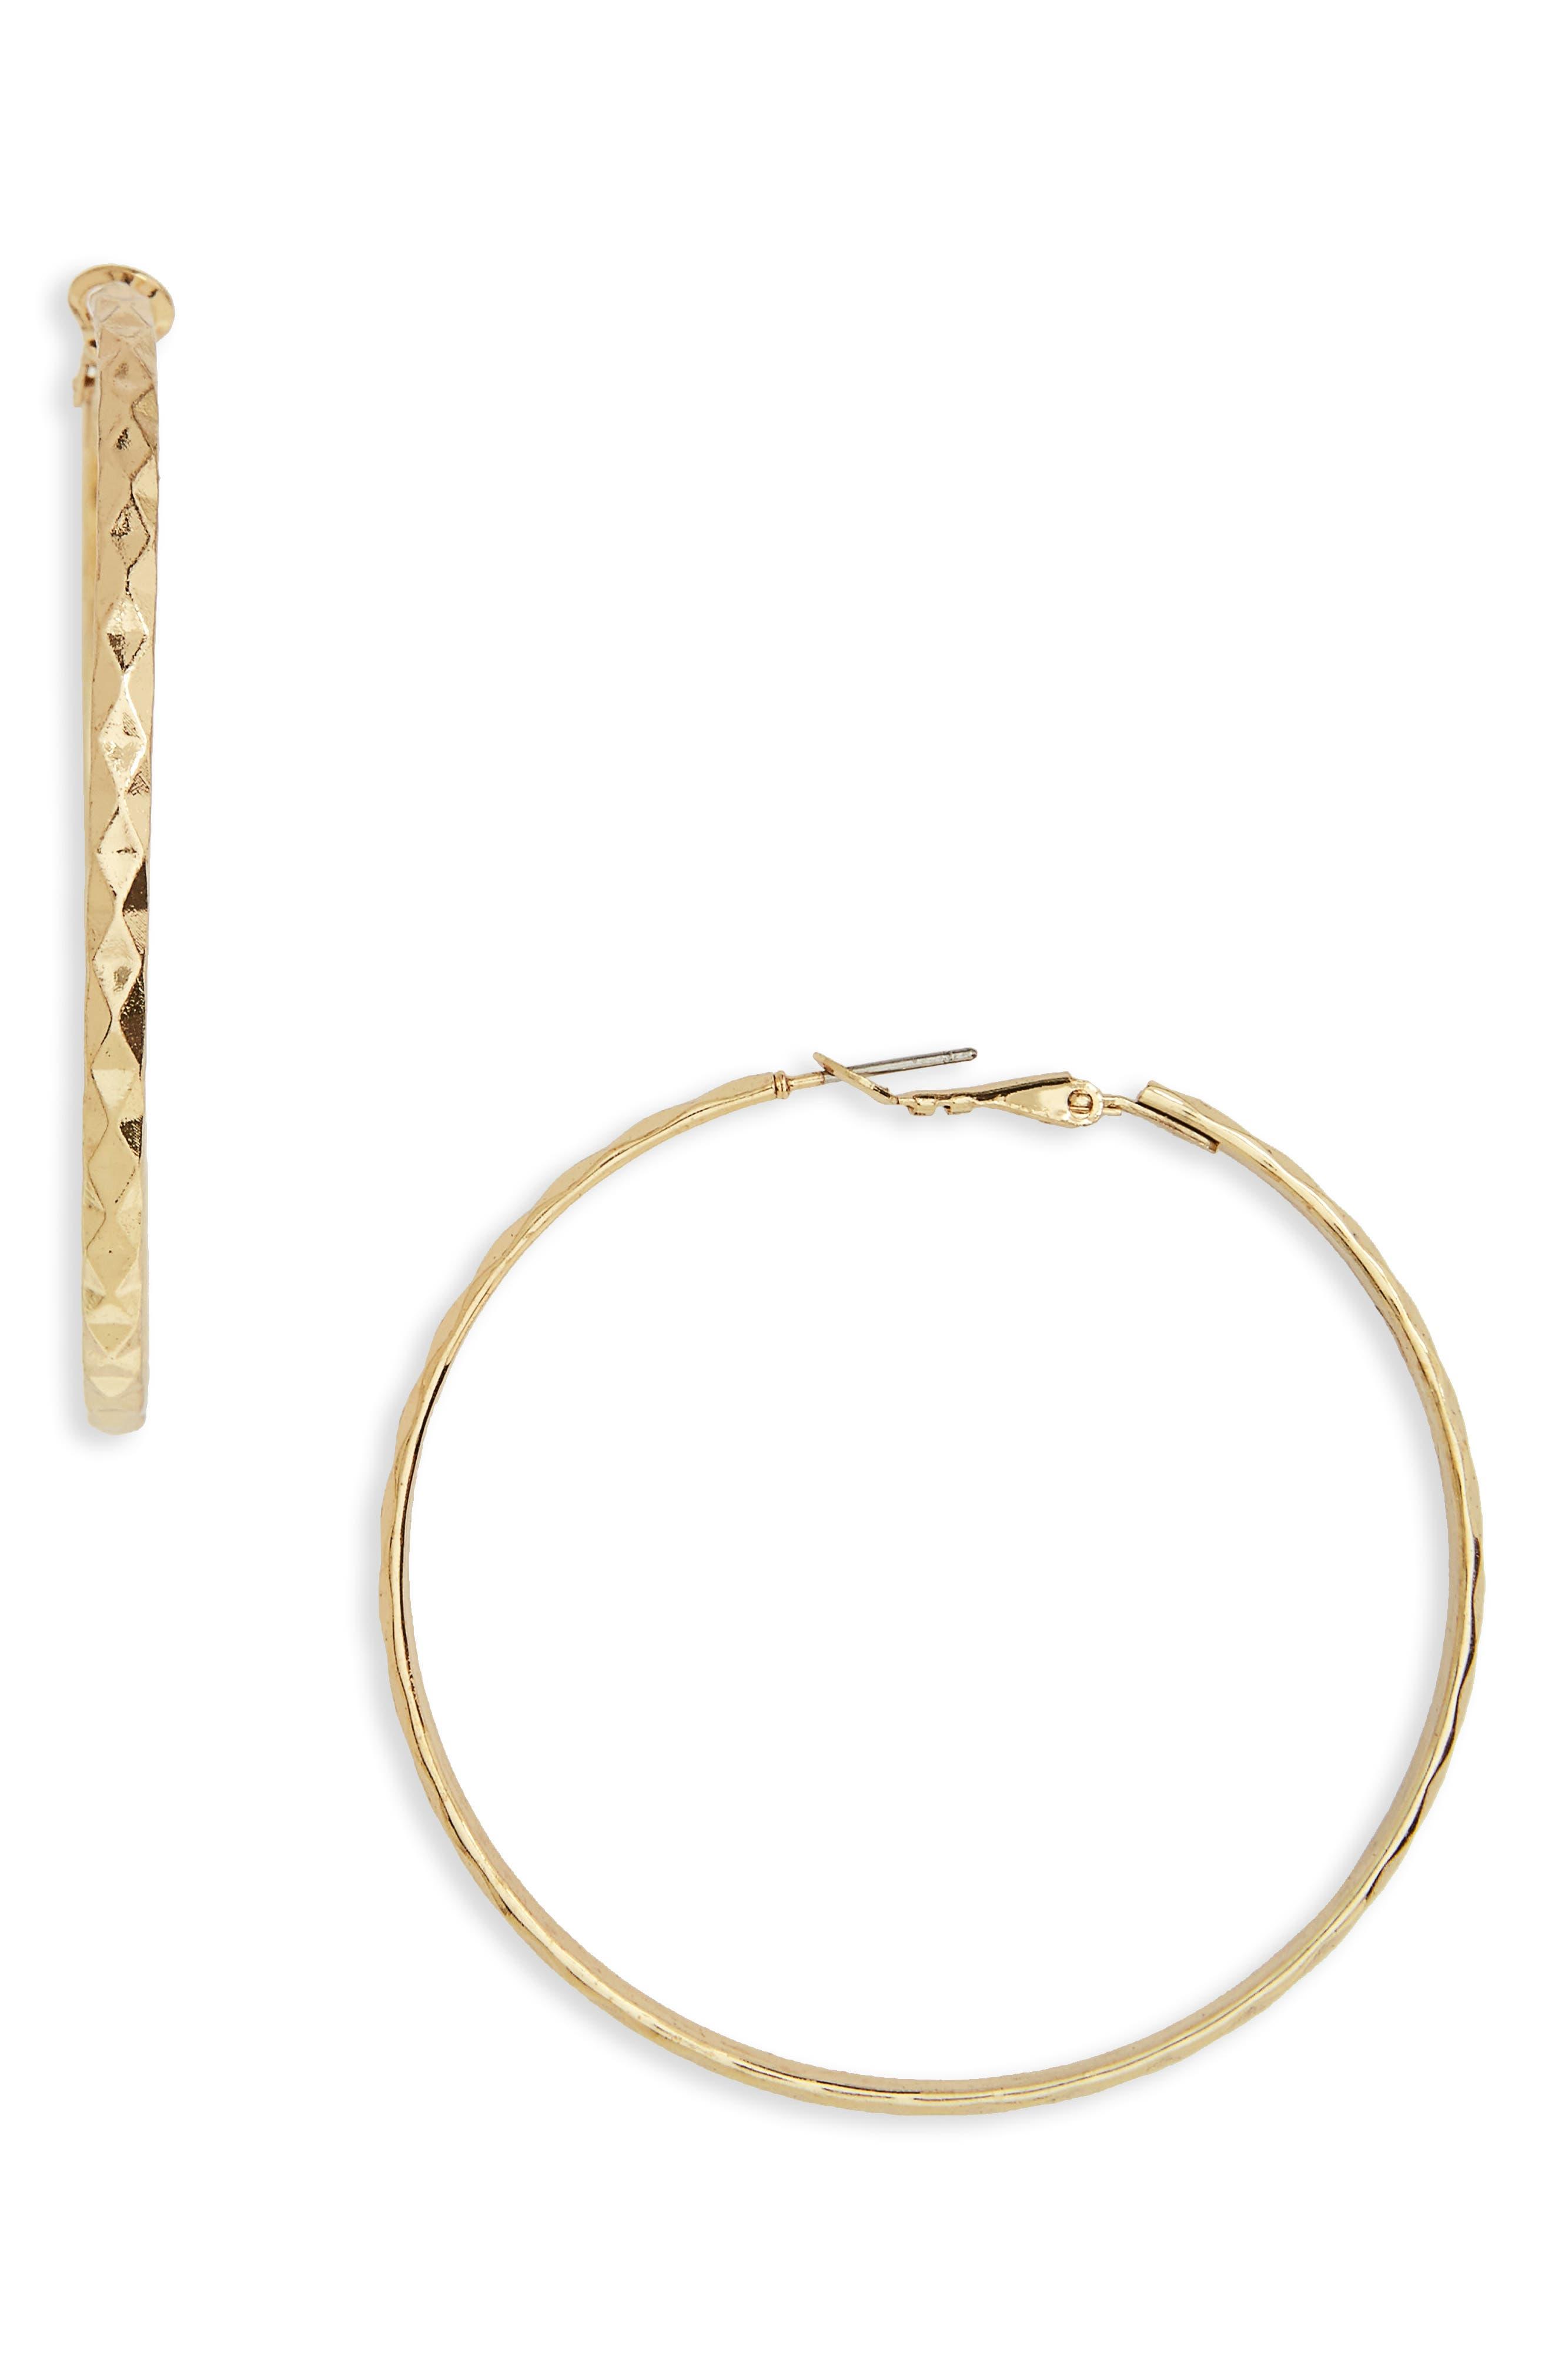 Hammered Hoop Earrings,                             Main thumbnail 1, color,                             Gold